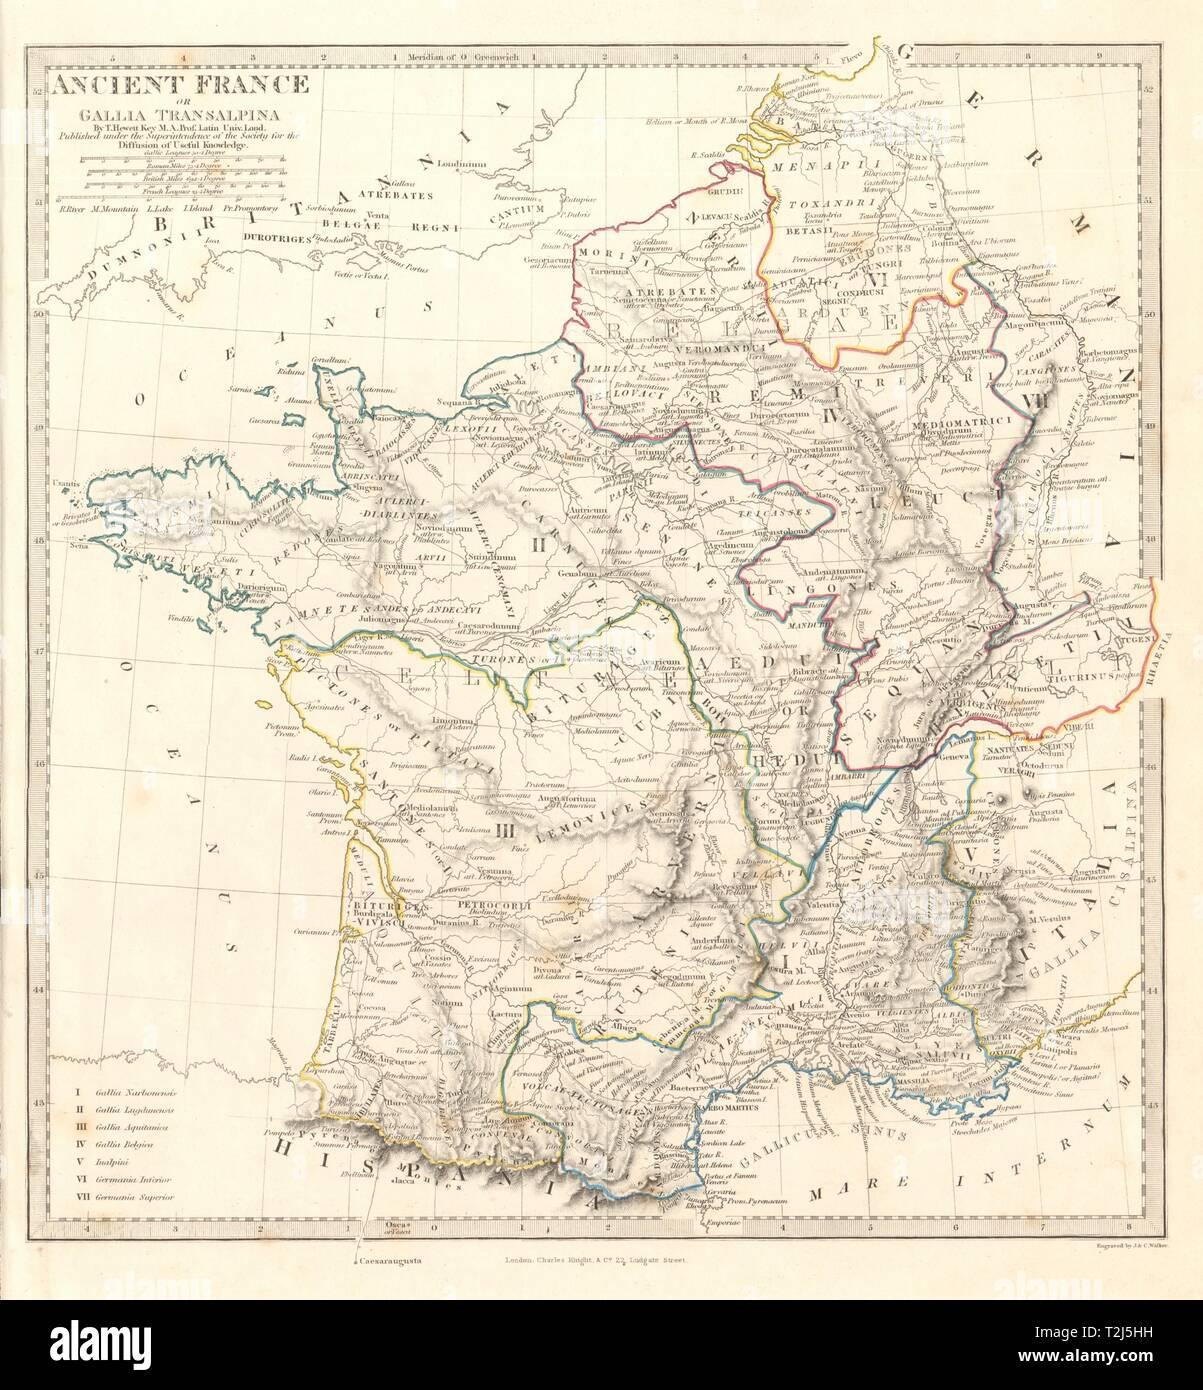 ANCIENT ROMAN FRANCE GAUL. Gallia Transalpina. Roman names ... on julius caesar, dacia map, roman republic, hadrian's wall map, roman legion, numidia on a map, iberian peninsula map, thrace map, england map, sparta map, ancient rome, visigoths map, macedonia map, mark antony, battle of alesia, spain map, huns map, cisalpine gaul, hispania map, iberian peninsula, gallic empire, byzantine empire map, alexandria map, sicily map, gallic wars, greece map, carolingian dynasty, zama map, pyrenees map, decline of the roman empire, constantinople map, athens map,